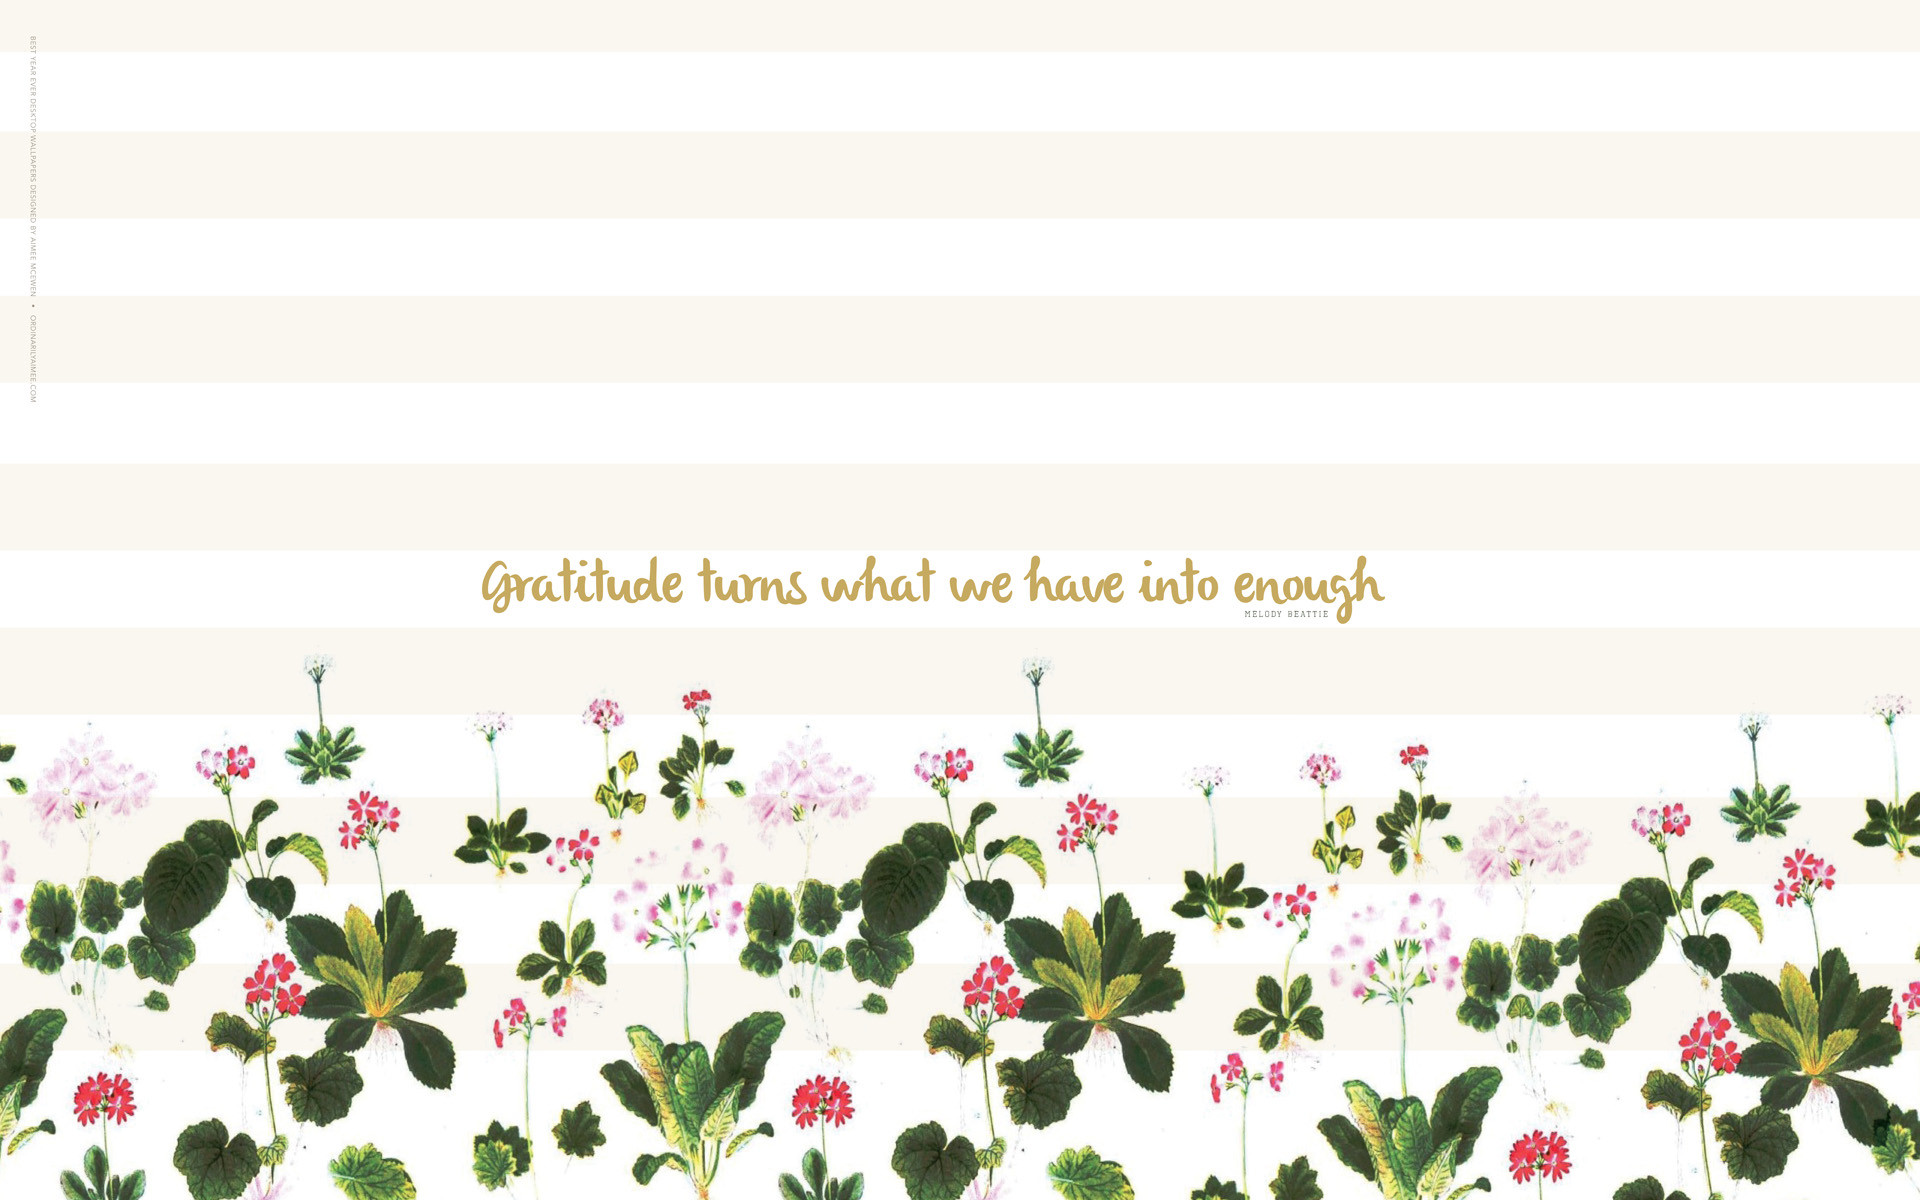 Mint white stripes floral Gratitude desktop wallpaper background | iPhone  and desktop wallpapers | Pinterest | Wallpaper backgrounds, Wallpaper and  Mac …